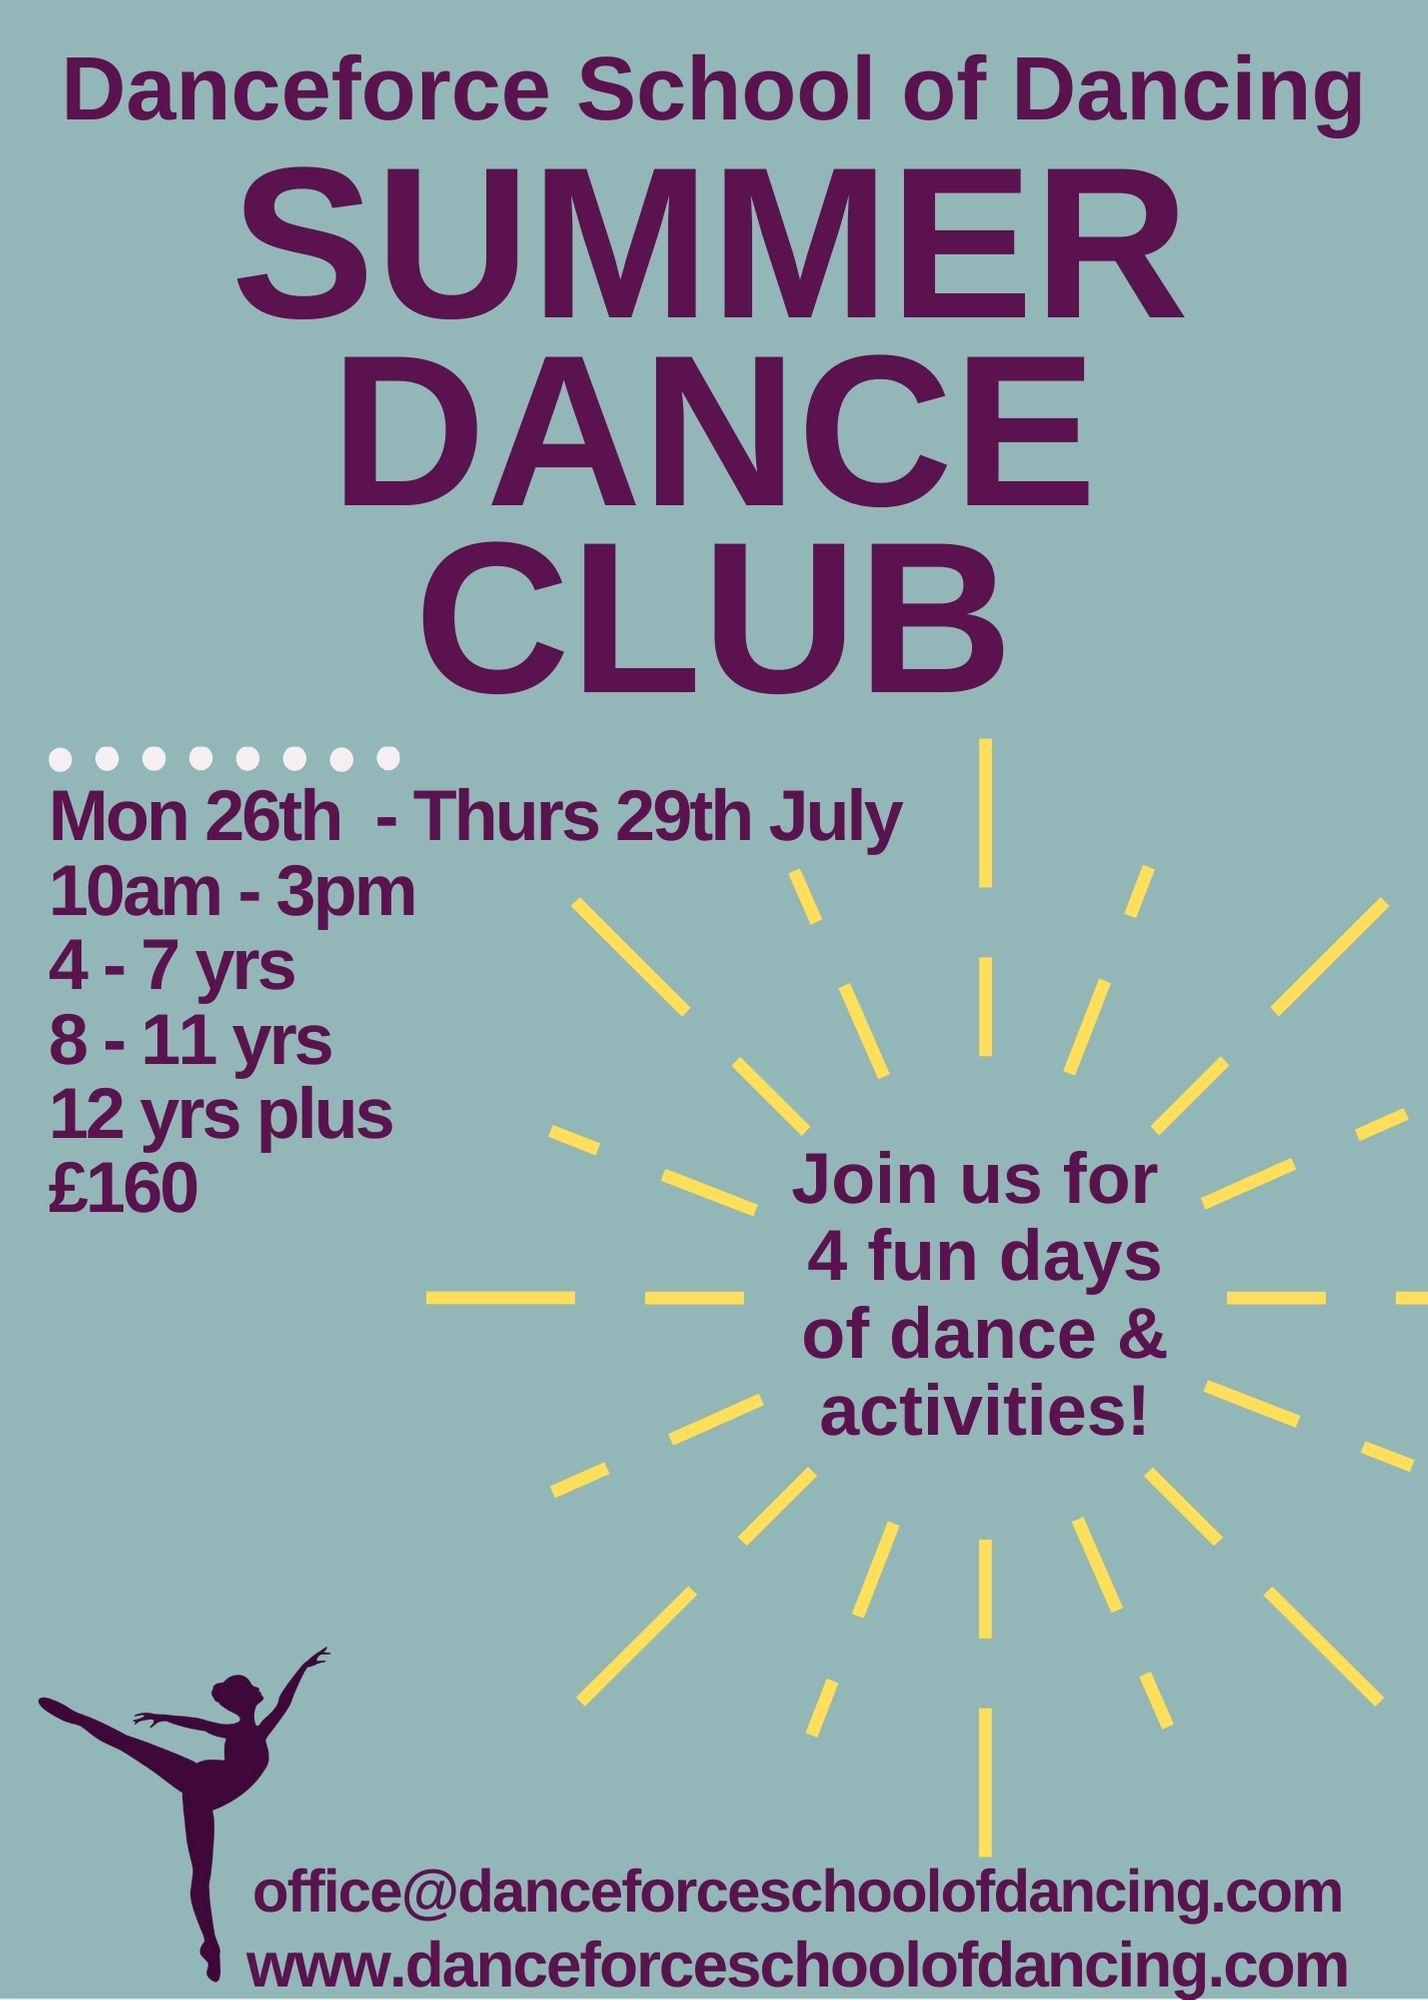 Danceforce Summer Dance Club!